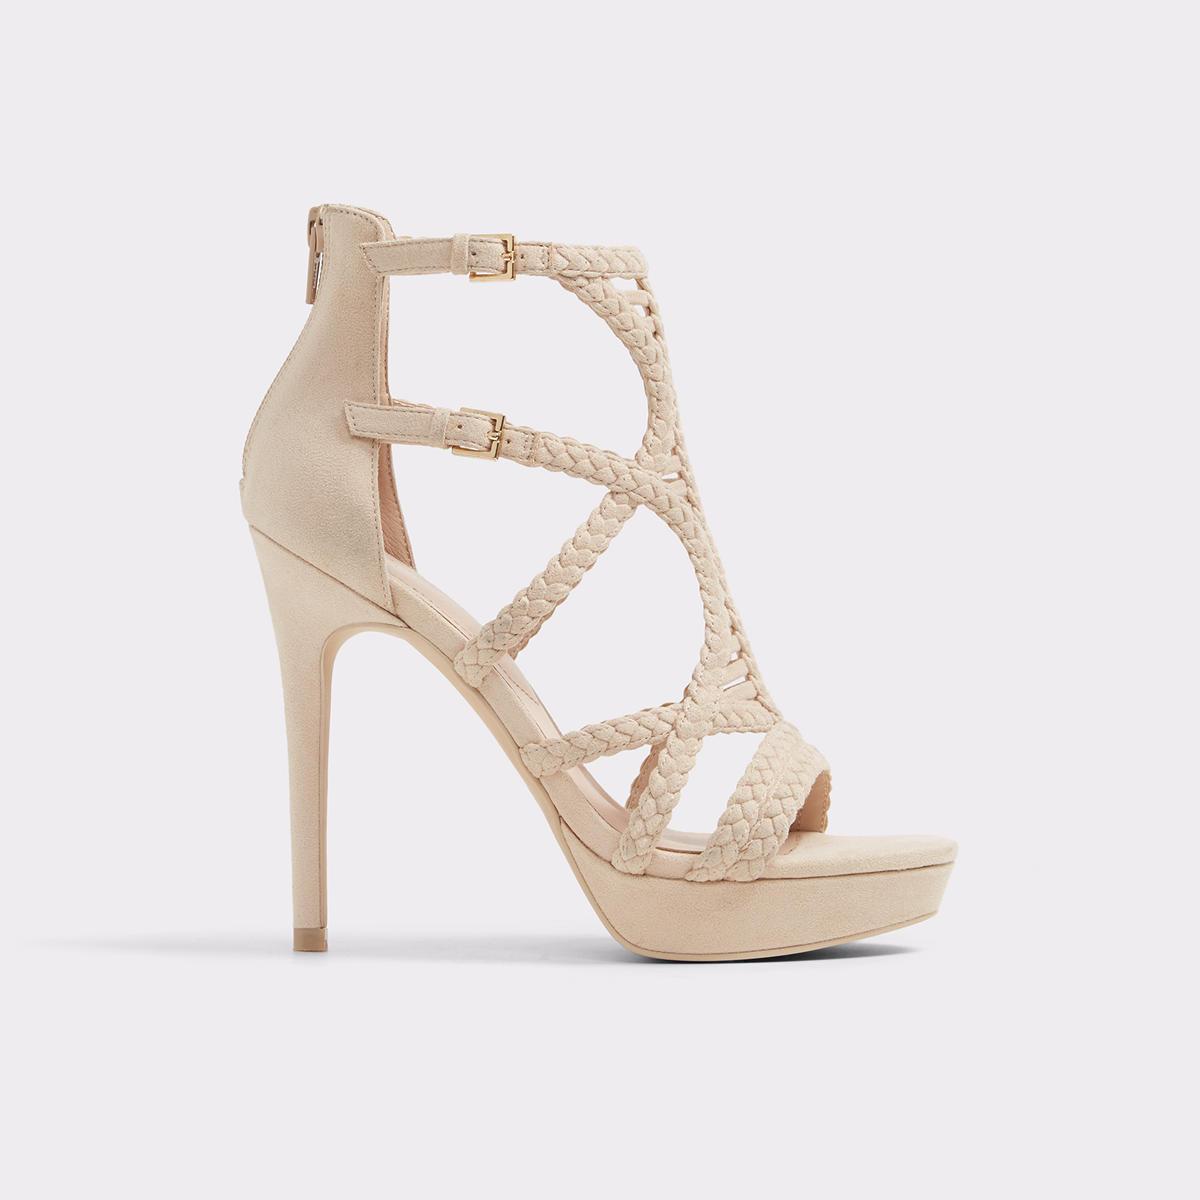 c8e569dfa17 Porella Bone Women s Sandals